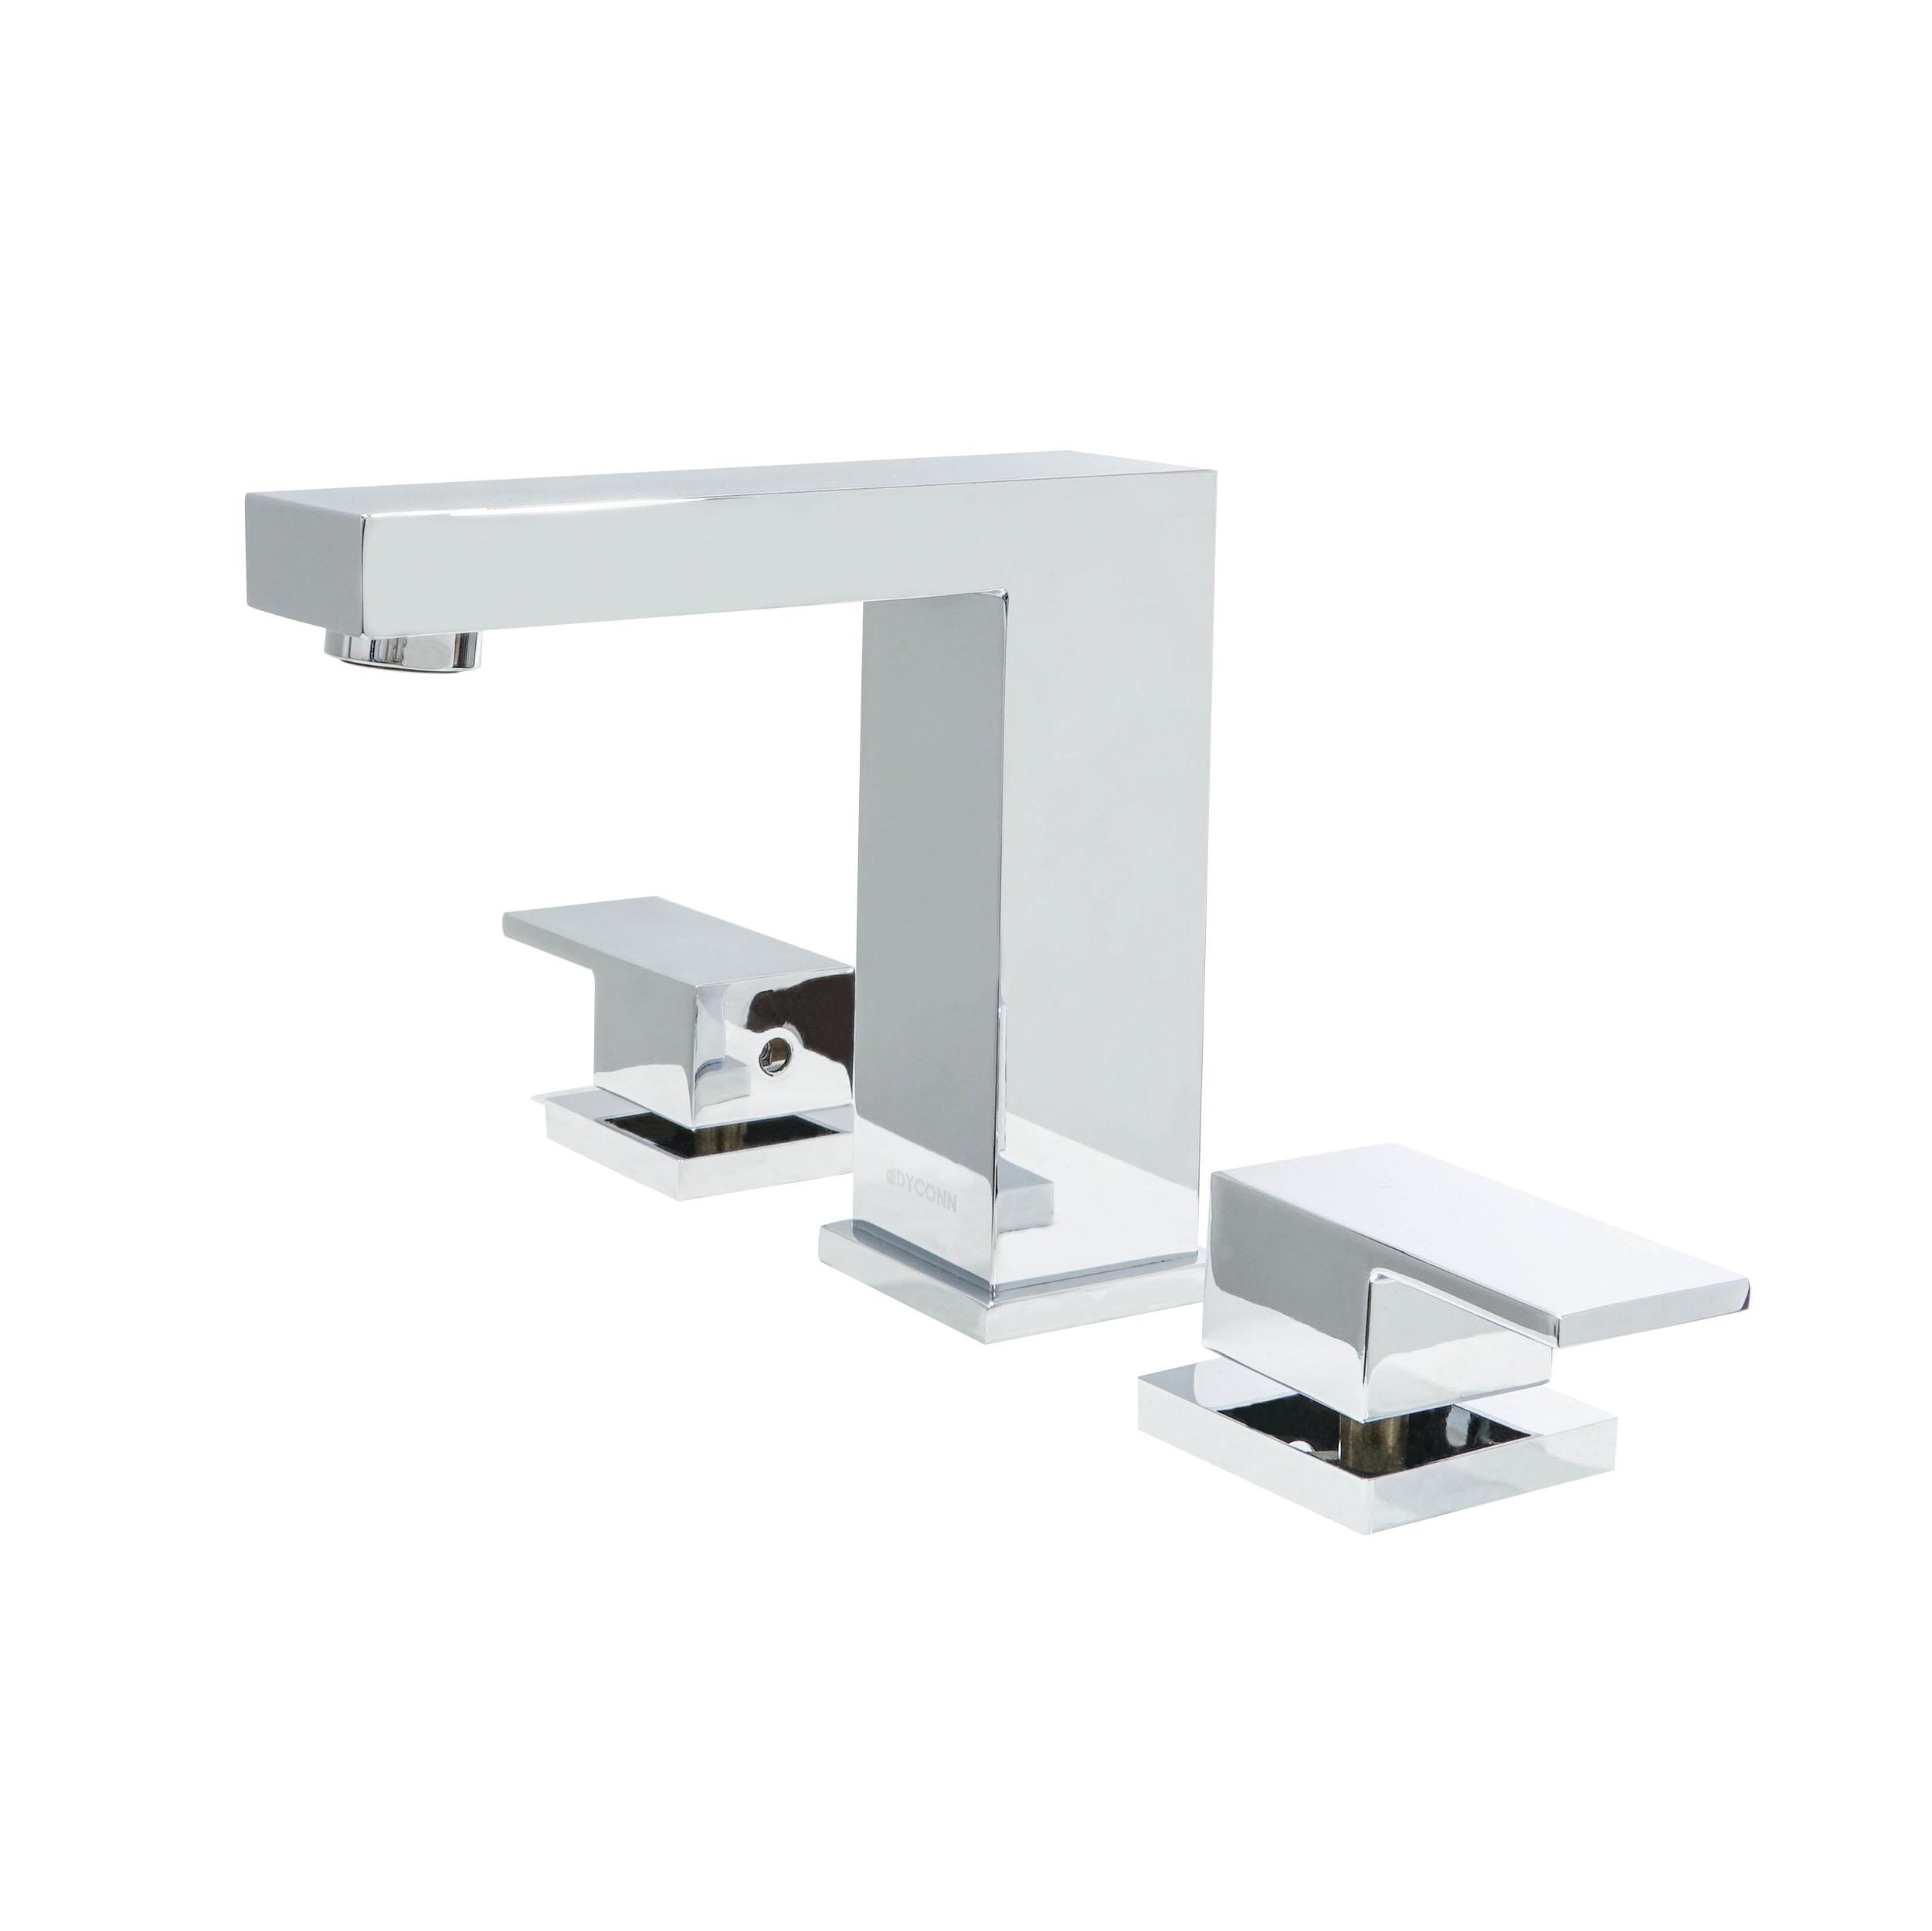 dyconn faucet ws3h11 sinclair 3 hole widespread bathroom faucet chrome